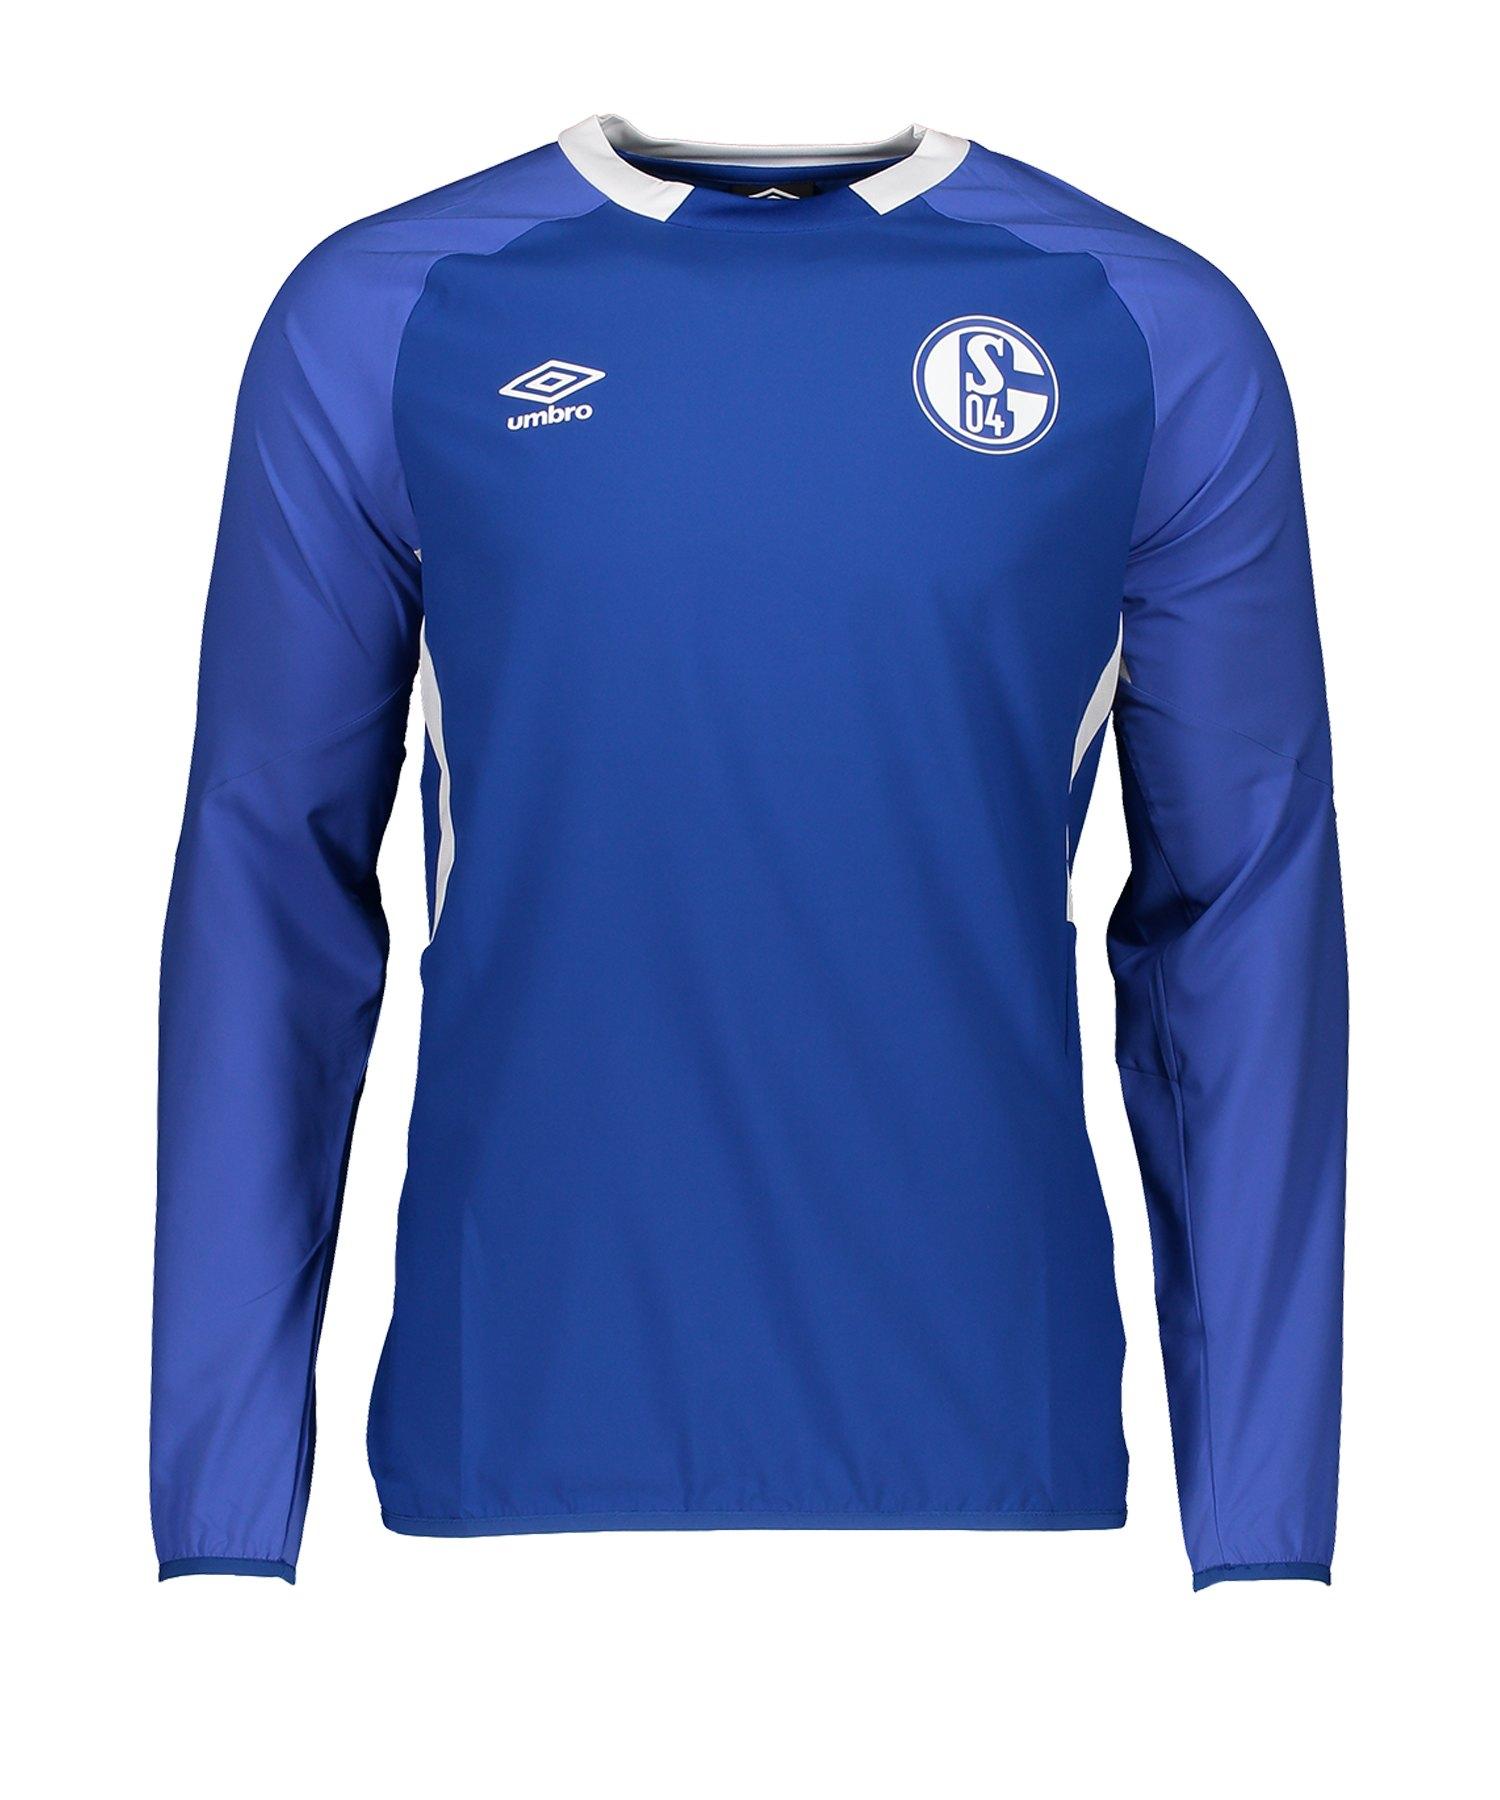 Umbro FC Schalke 04 Drill Top Sweatshirt FHPB - blau